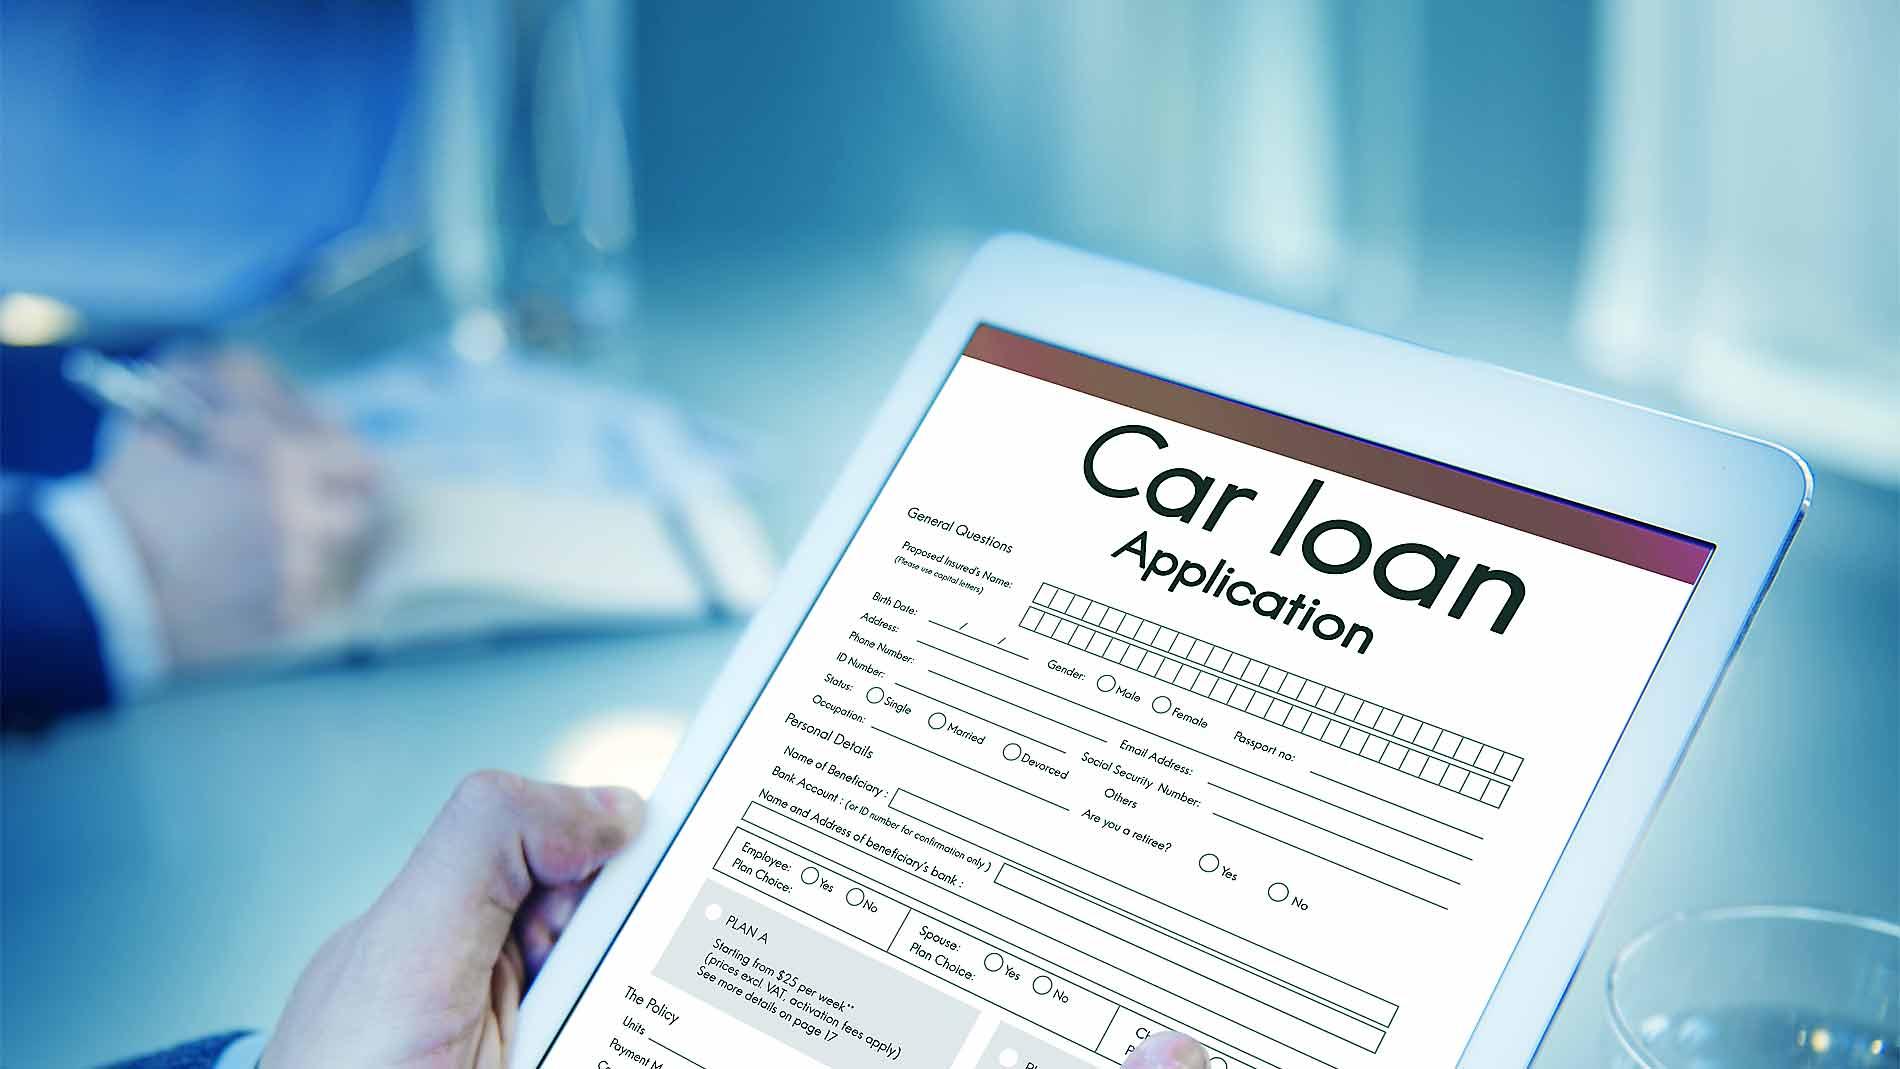 Fast Start Auto Used Bhph Cars Salt Lake City Ut Bad Credit Car